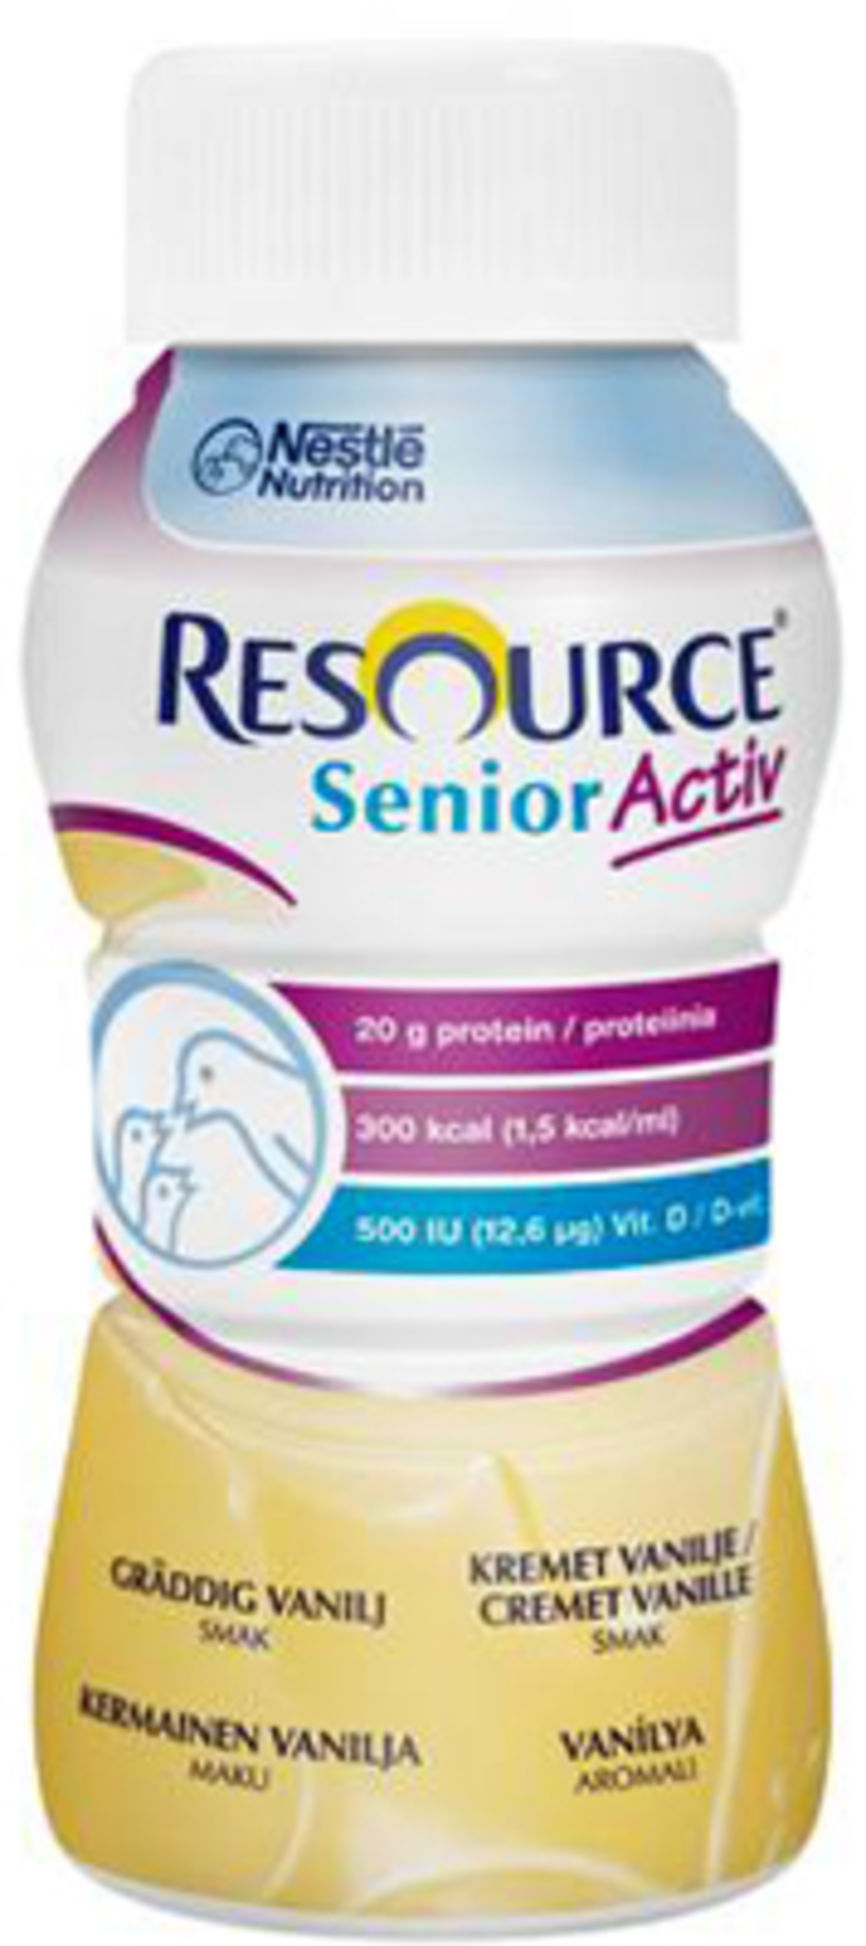 resource senior active